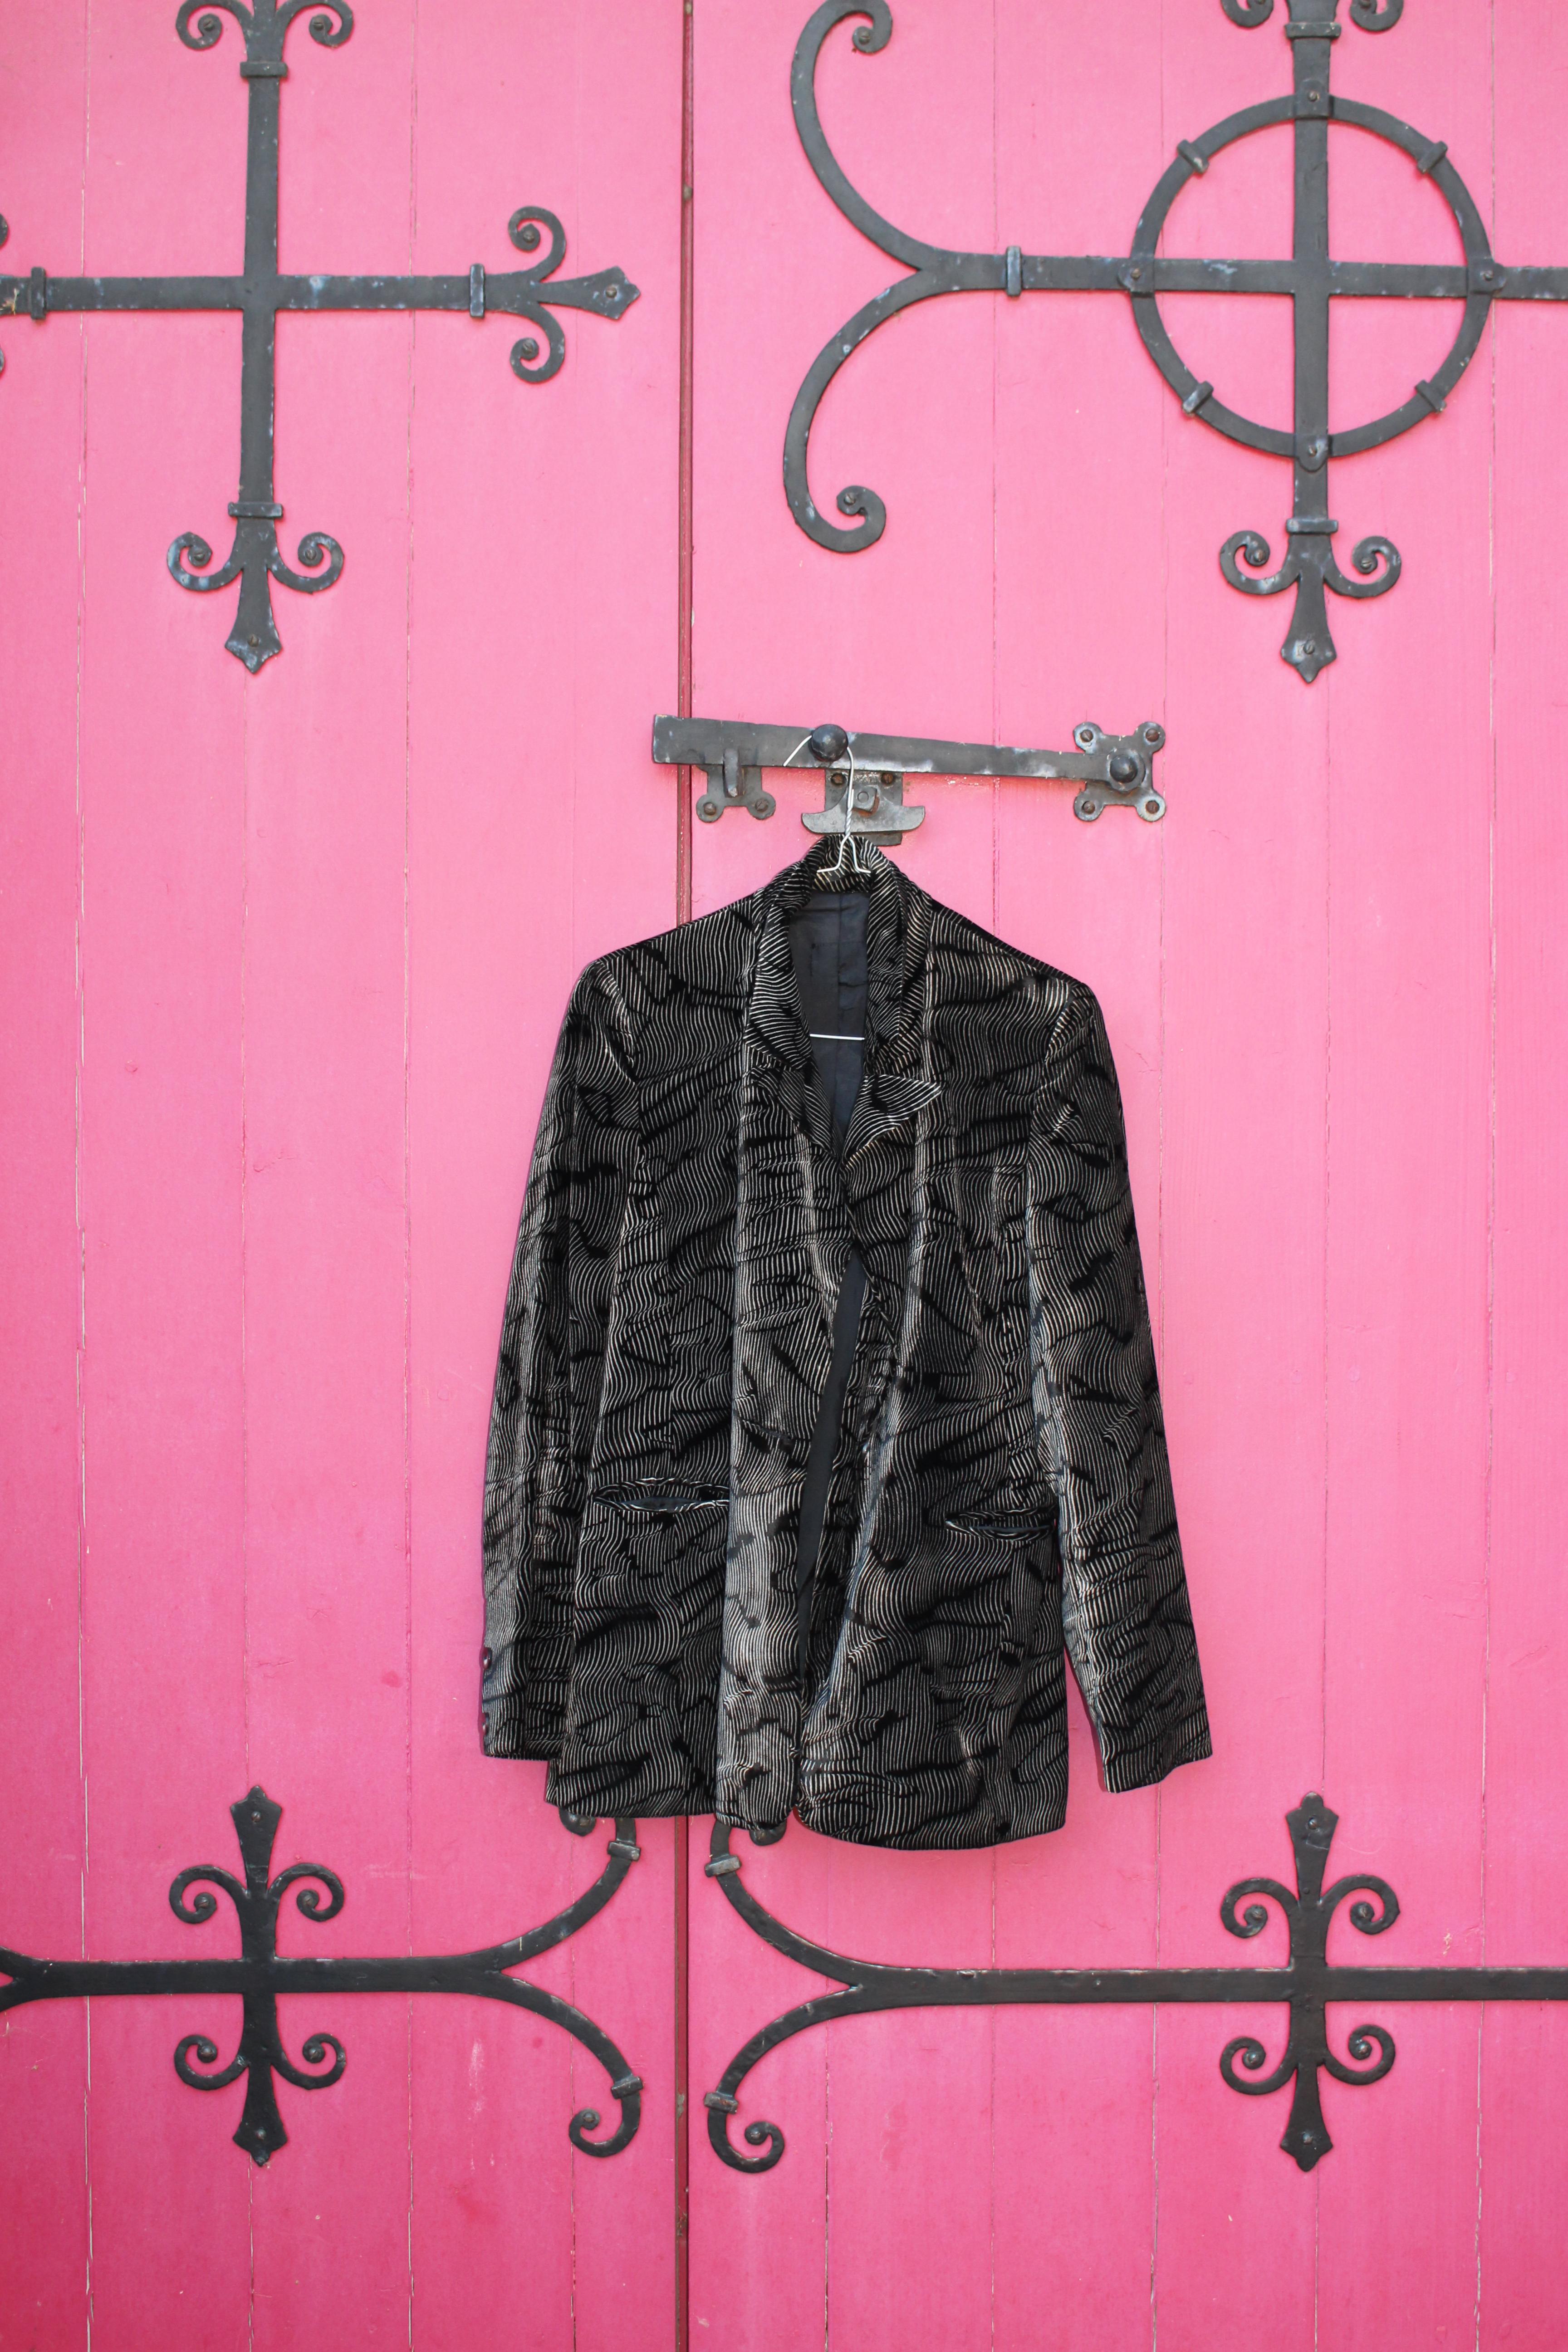 Zebra stripe velvet jacket, from Unicorn, 5 Ship Street, Oxford